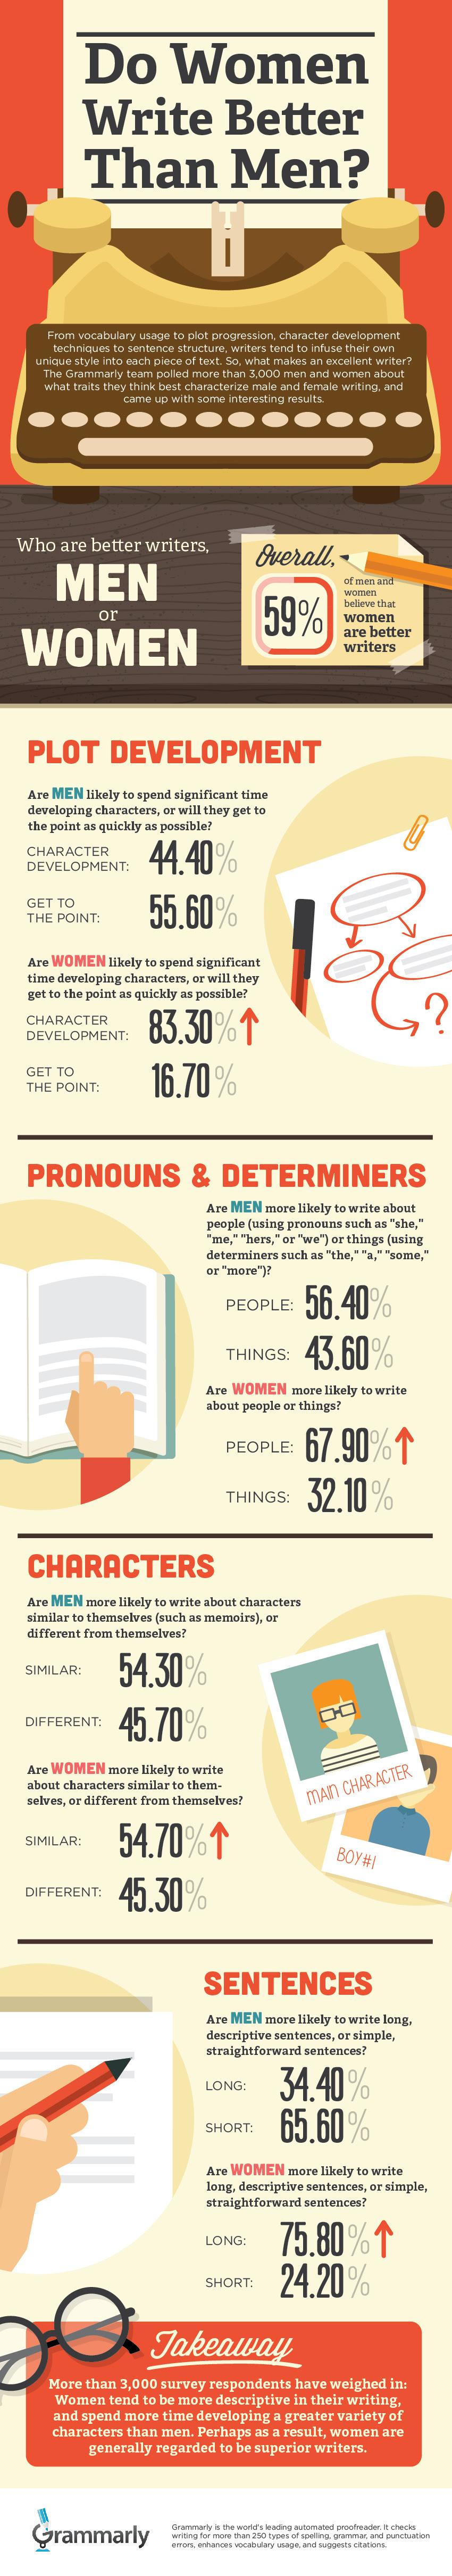 MenvsWomen Writers infographic